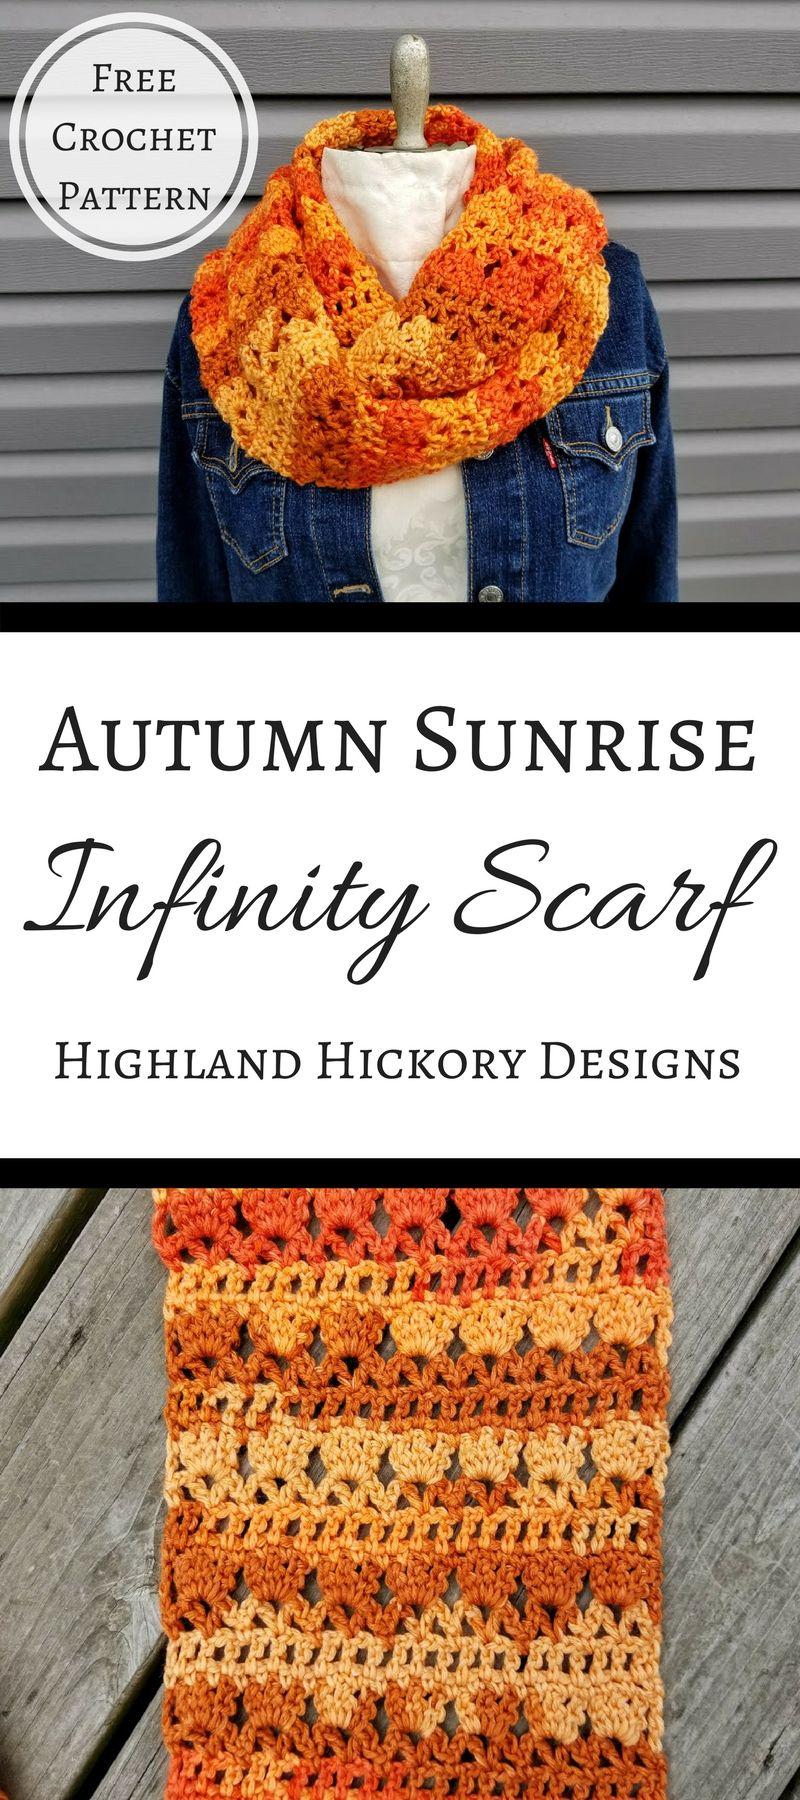 Autumn Sunrise Infinity Scarf | Knit/Crochet Projects | Pinterest ...